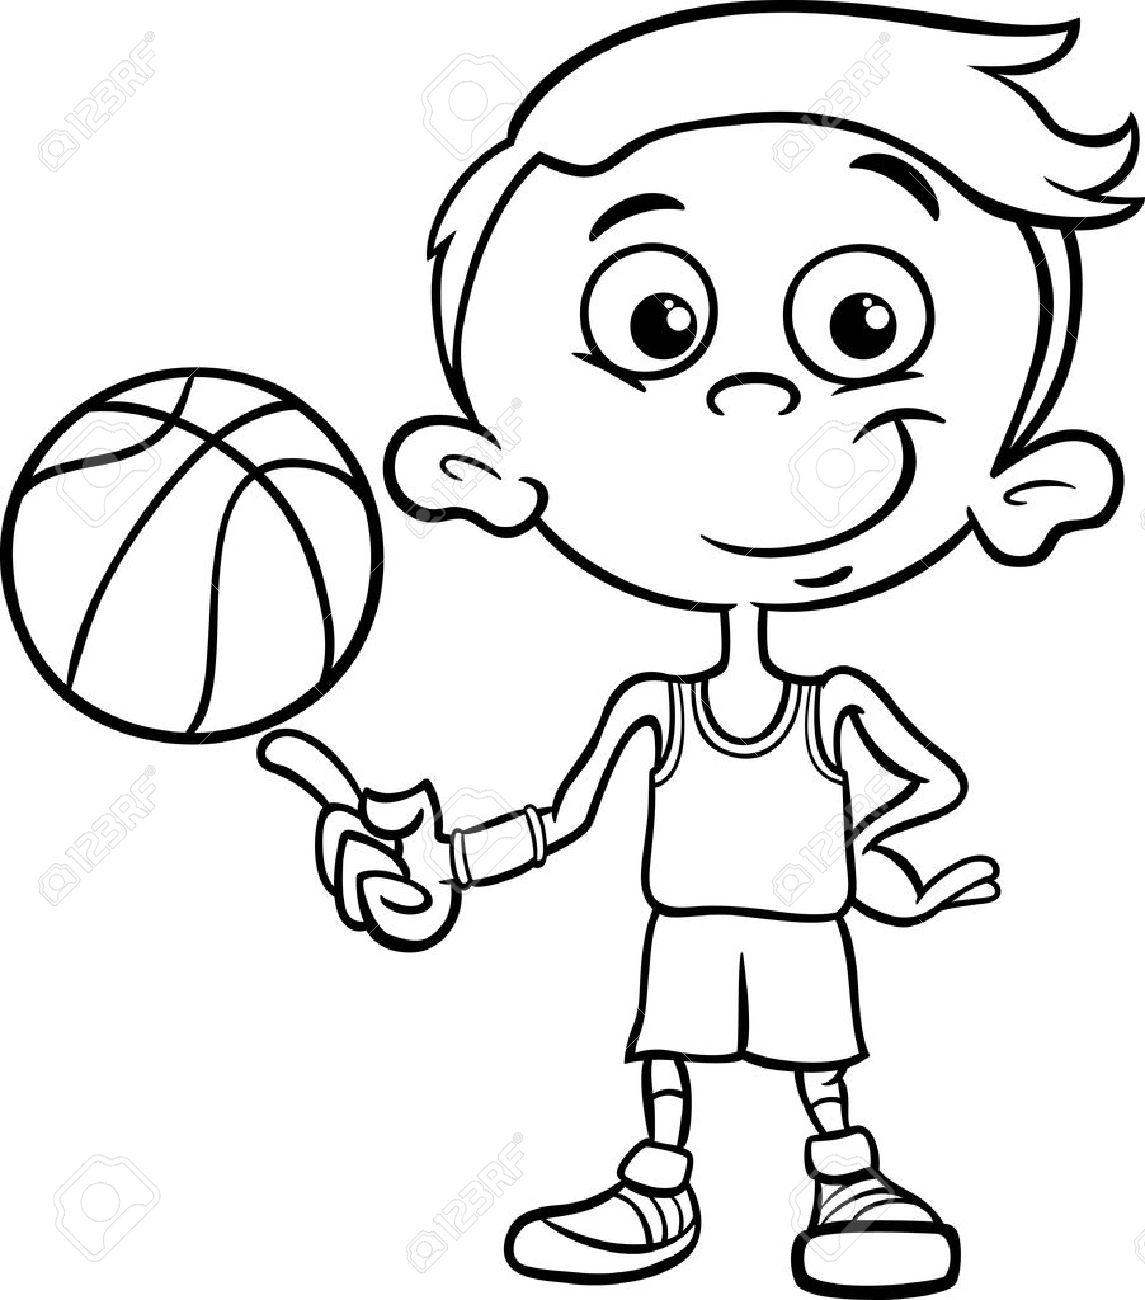 1145x1300 Black And White Cartoon Illustration Of Funny Boy Basketball